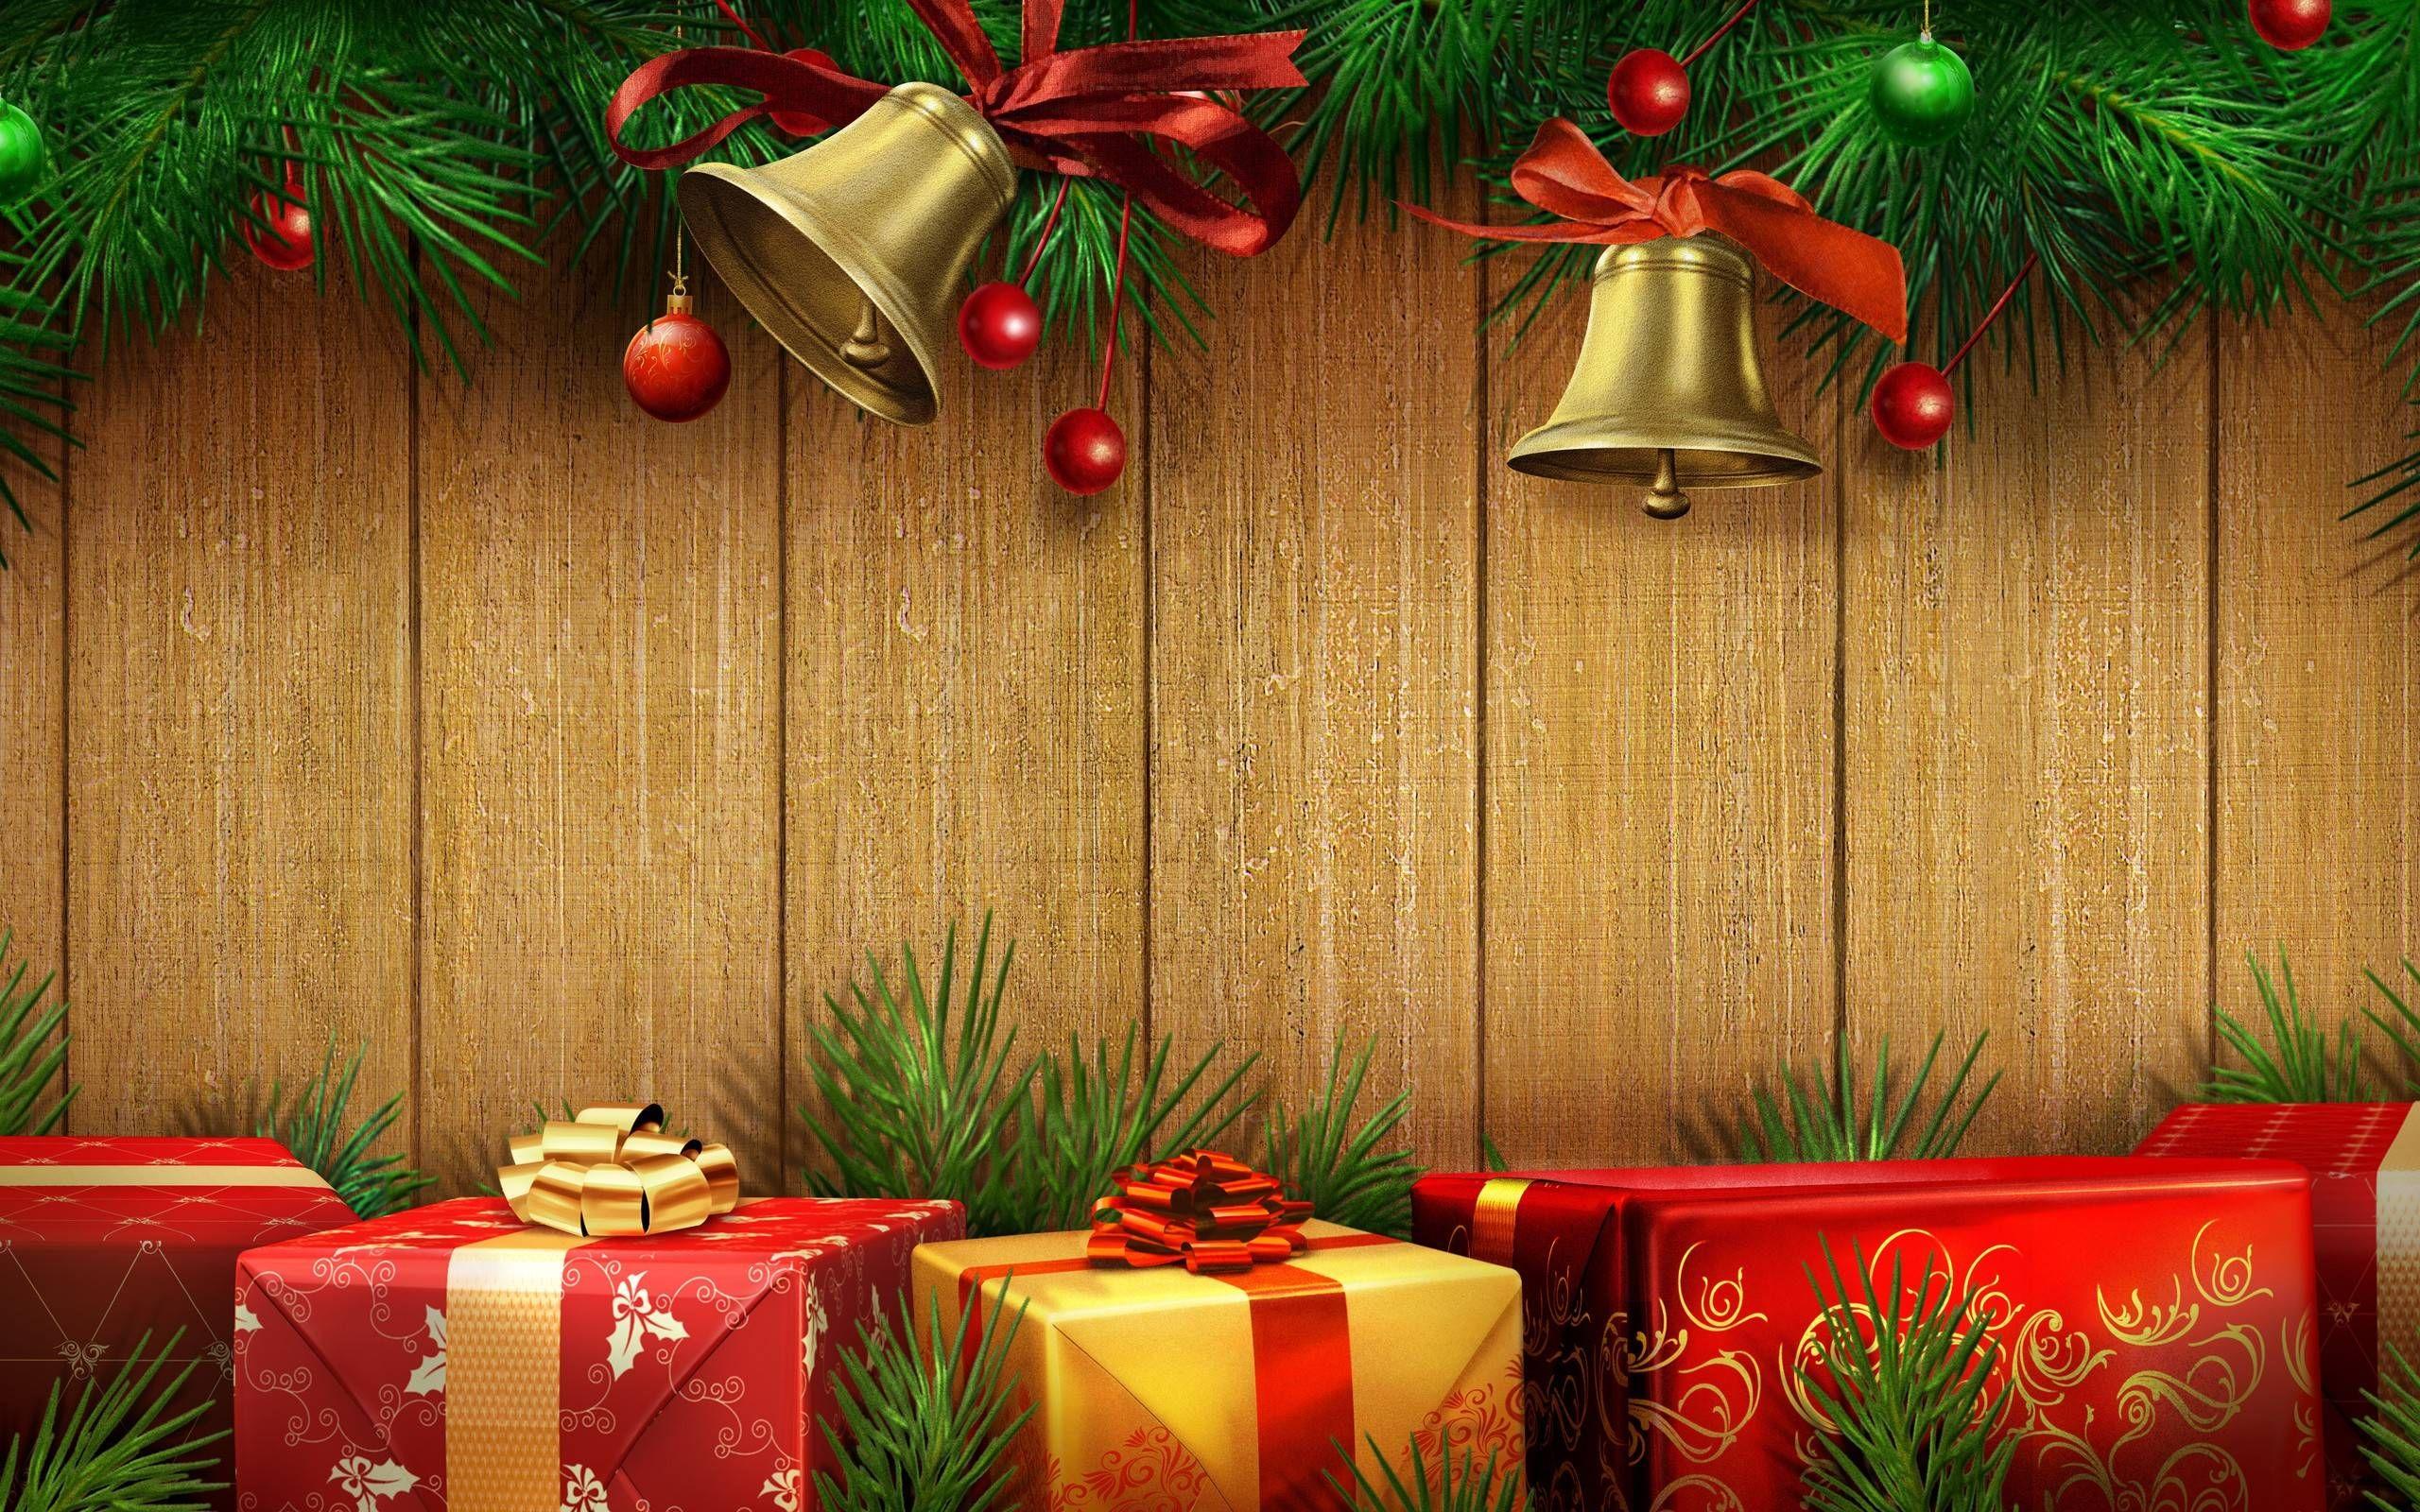 christmas gift backgrounds wallpaper | wallpapers for desktop